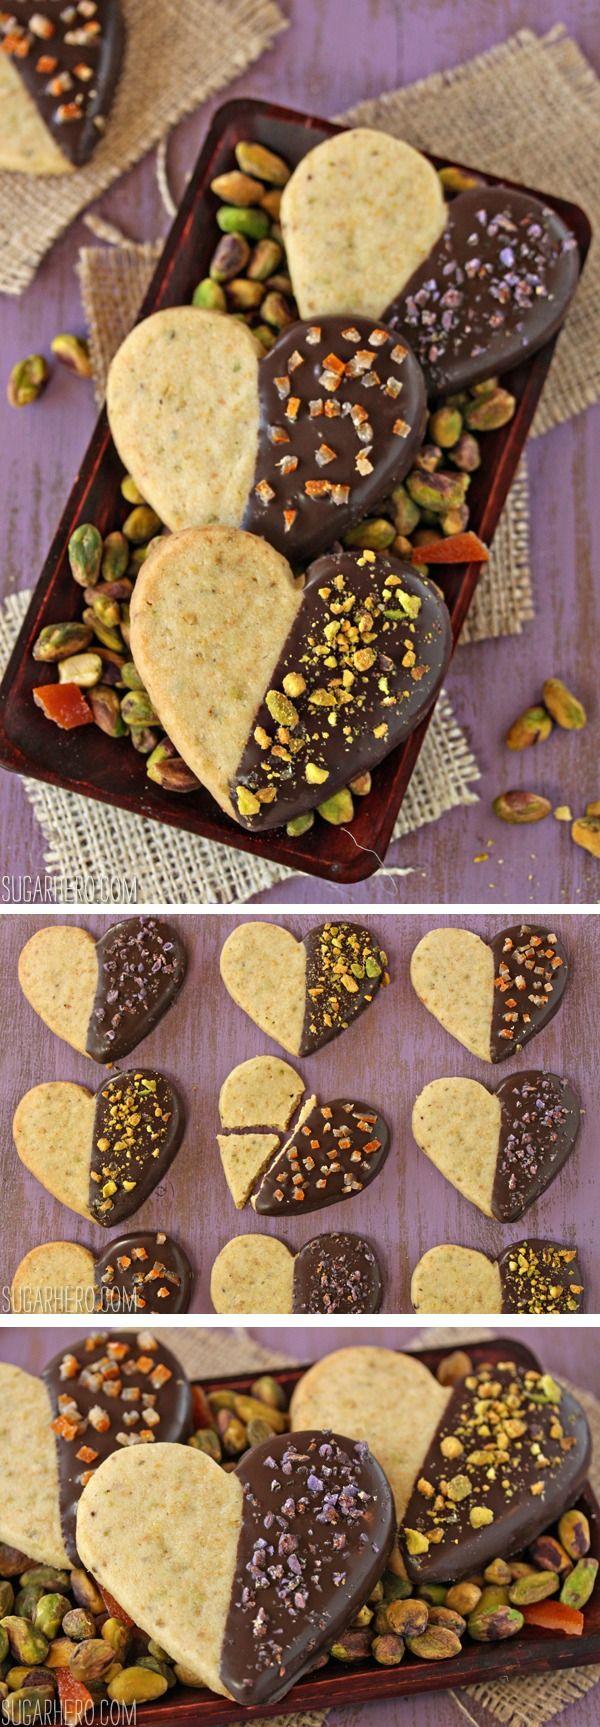 Pistachio Shortbread Cookies, dipped in chocolate! | From SugarHero.com